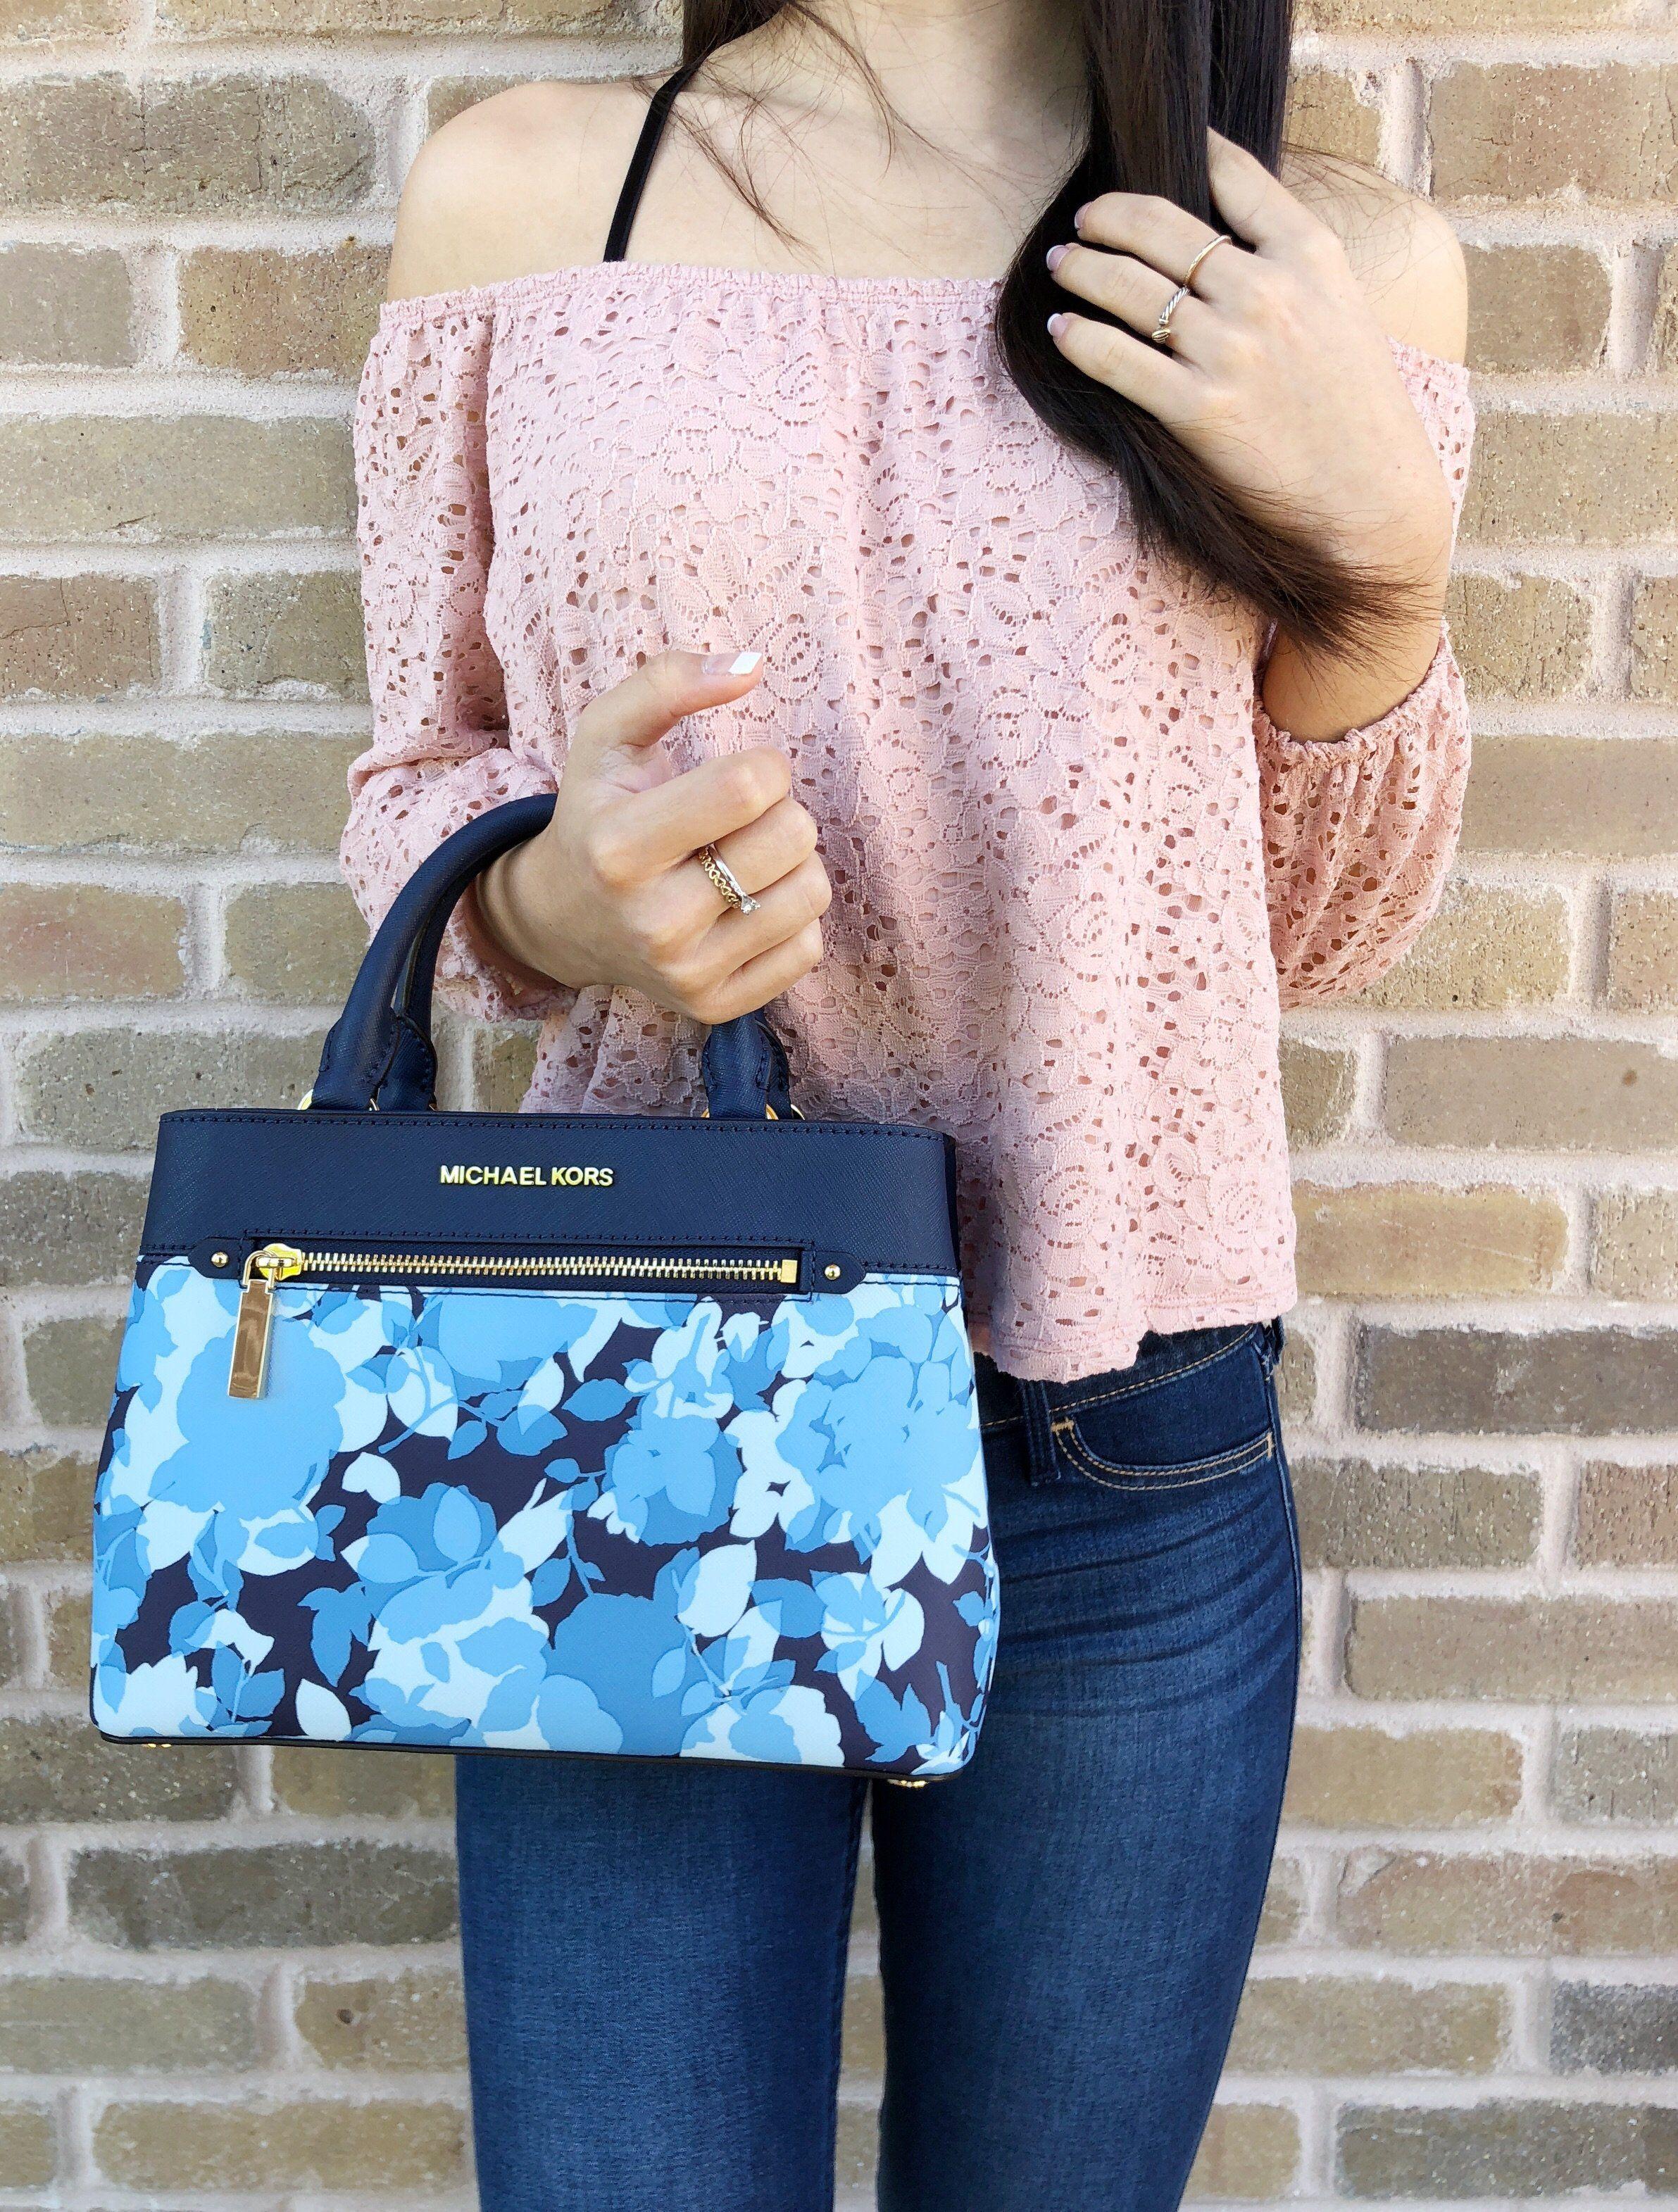 d2e4633dbf56 Michael Kors Hailee Kellen XS Satchel Small Crossbody Navy Blue White Floral  #poshpackages #ebay #mercariseller #amazondeals #ebaybusiness #MichaelKors  ...